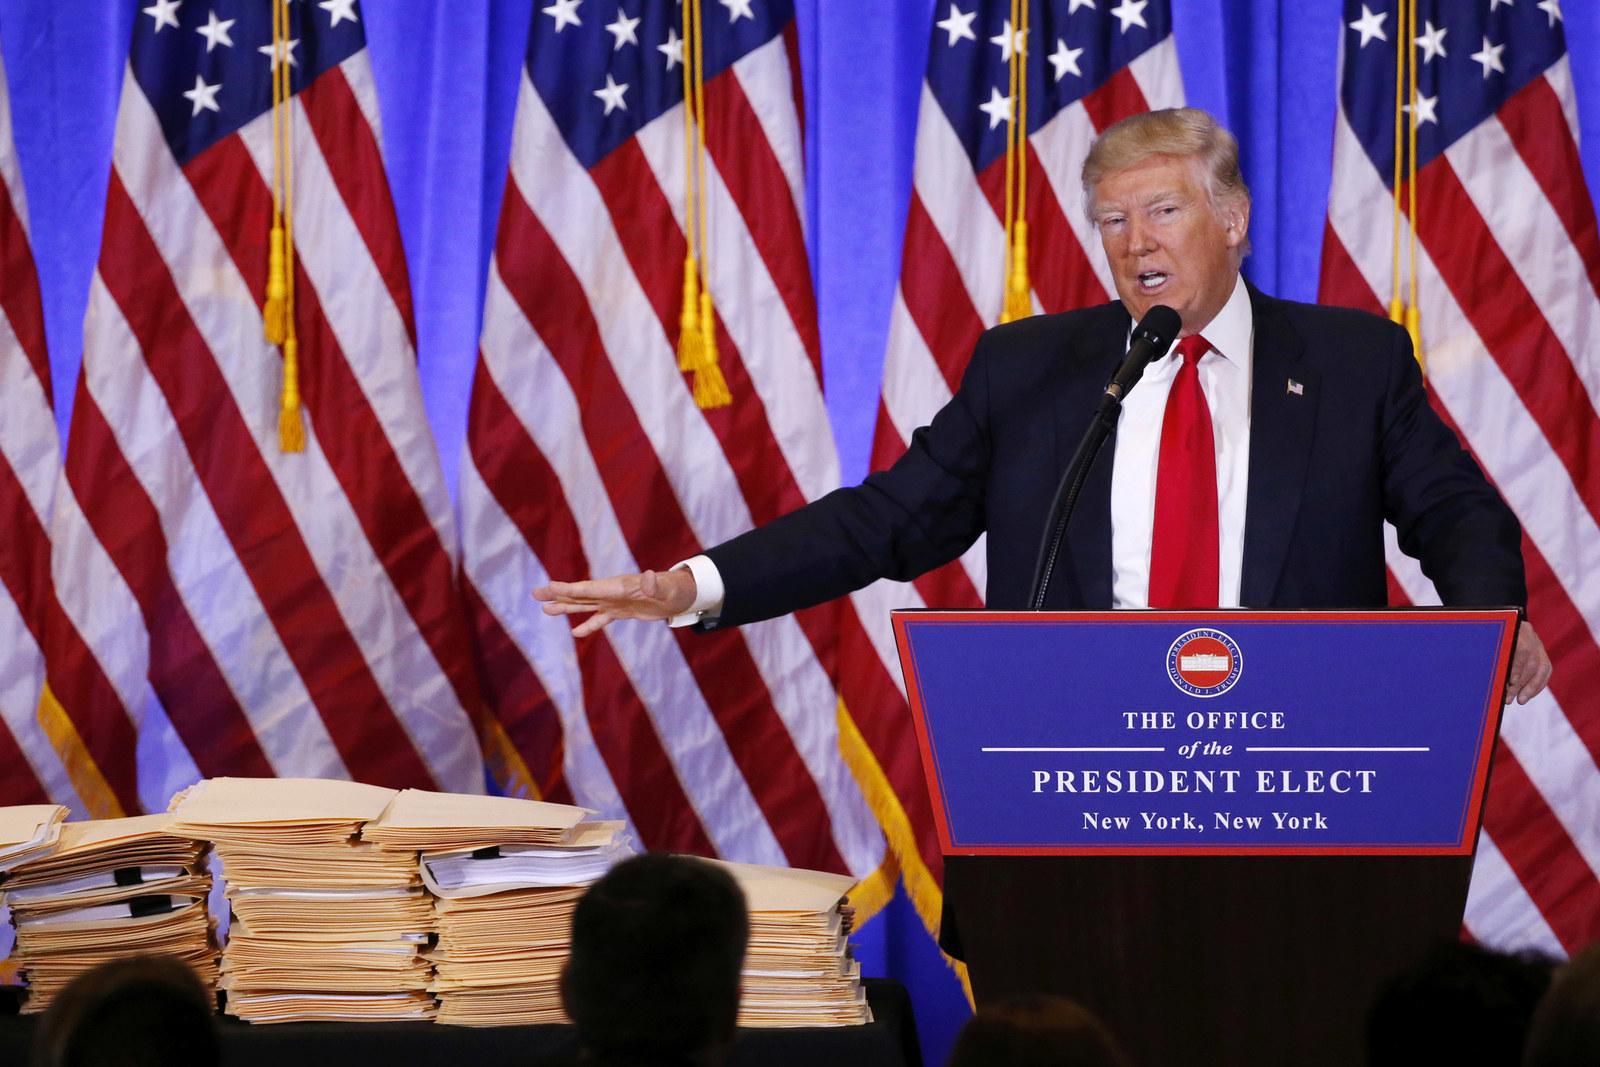 Donal Trump tells CNN Reporter